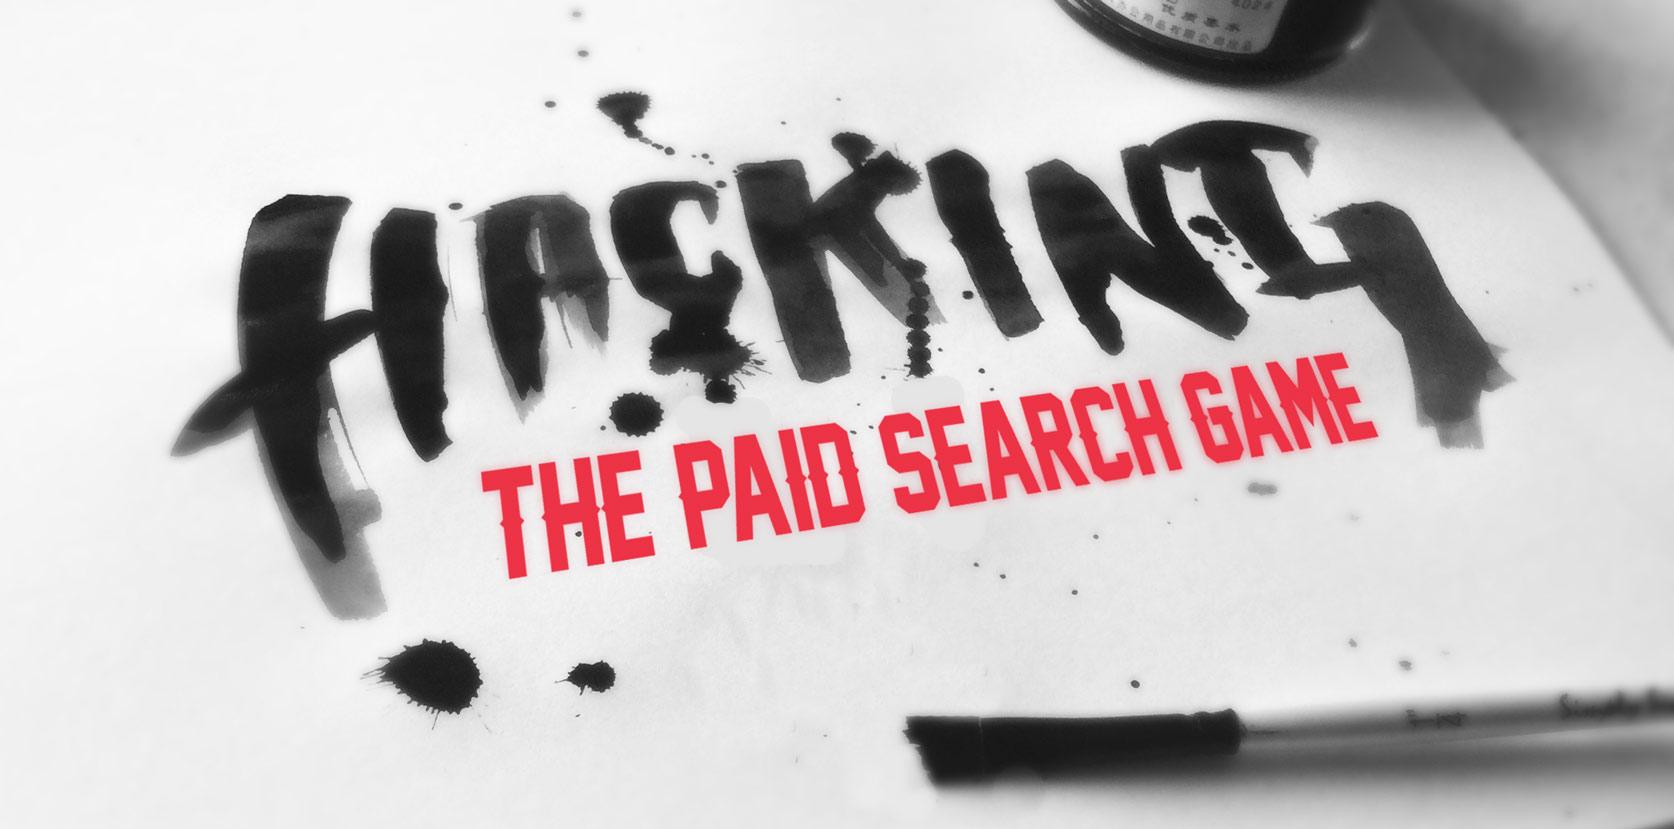 hacking paid search game - 3 strategies - remarketing -web design - wordpress